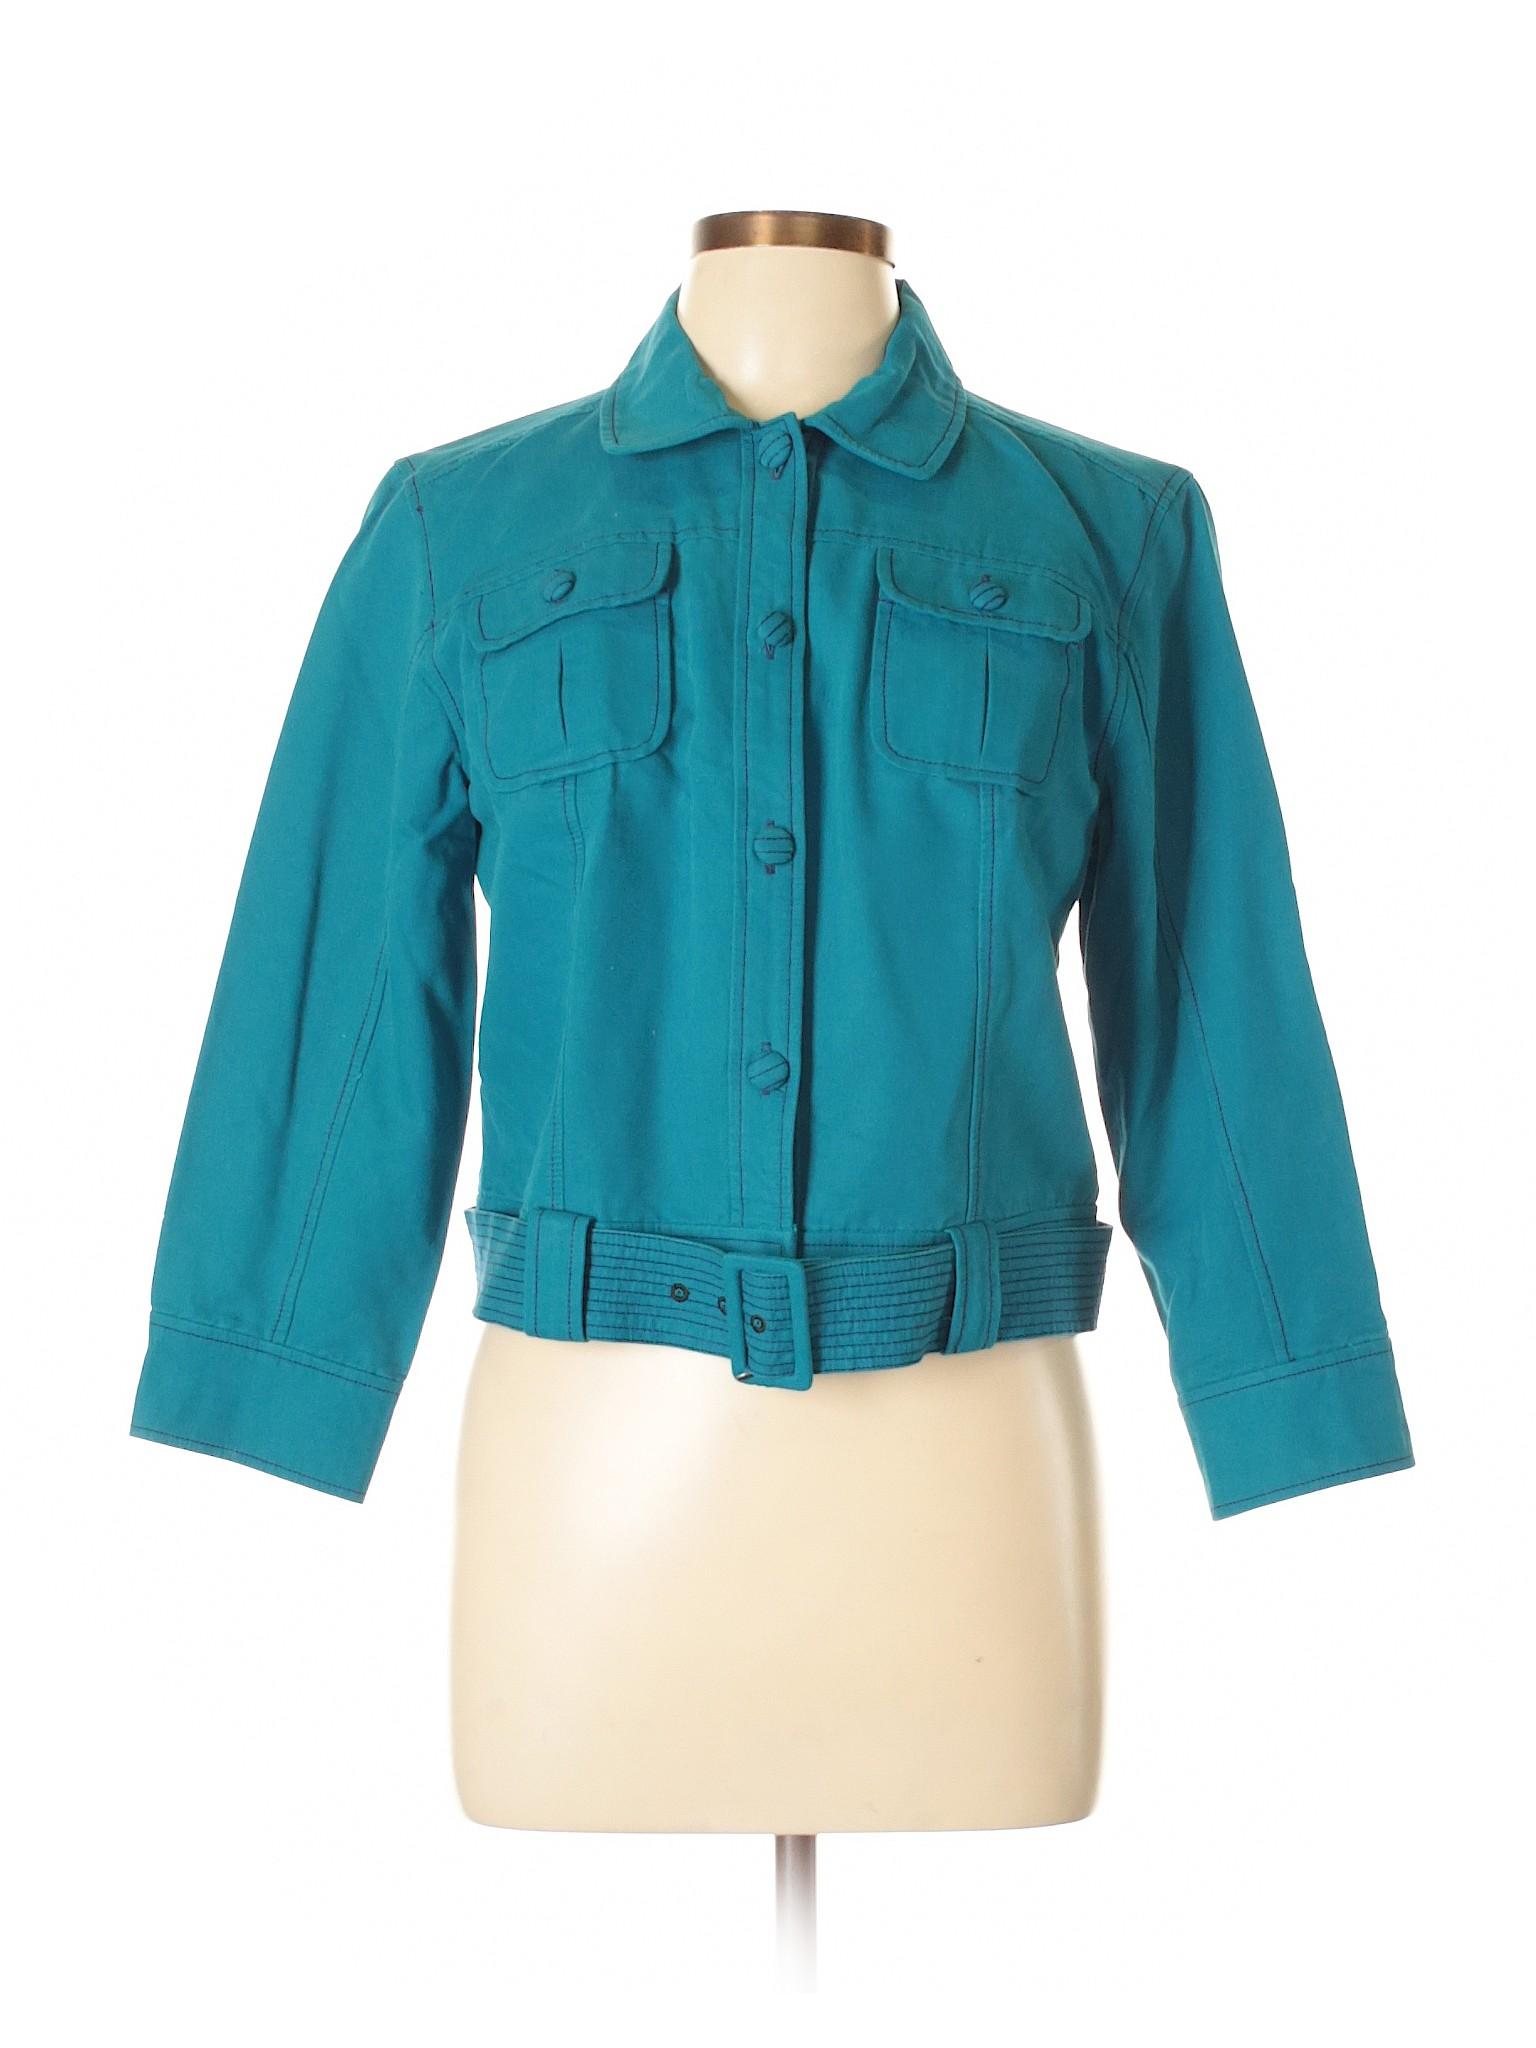 Schouler Boutique Target Jacket for Proenza 51nWq6wgZ8